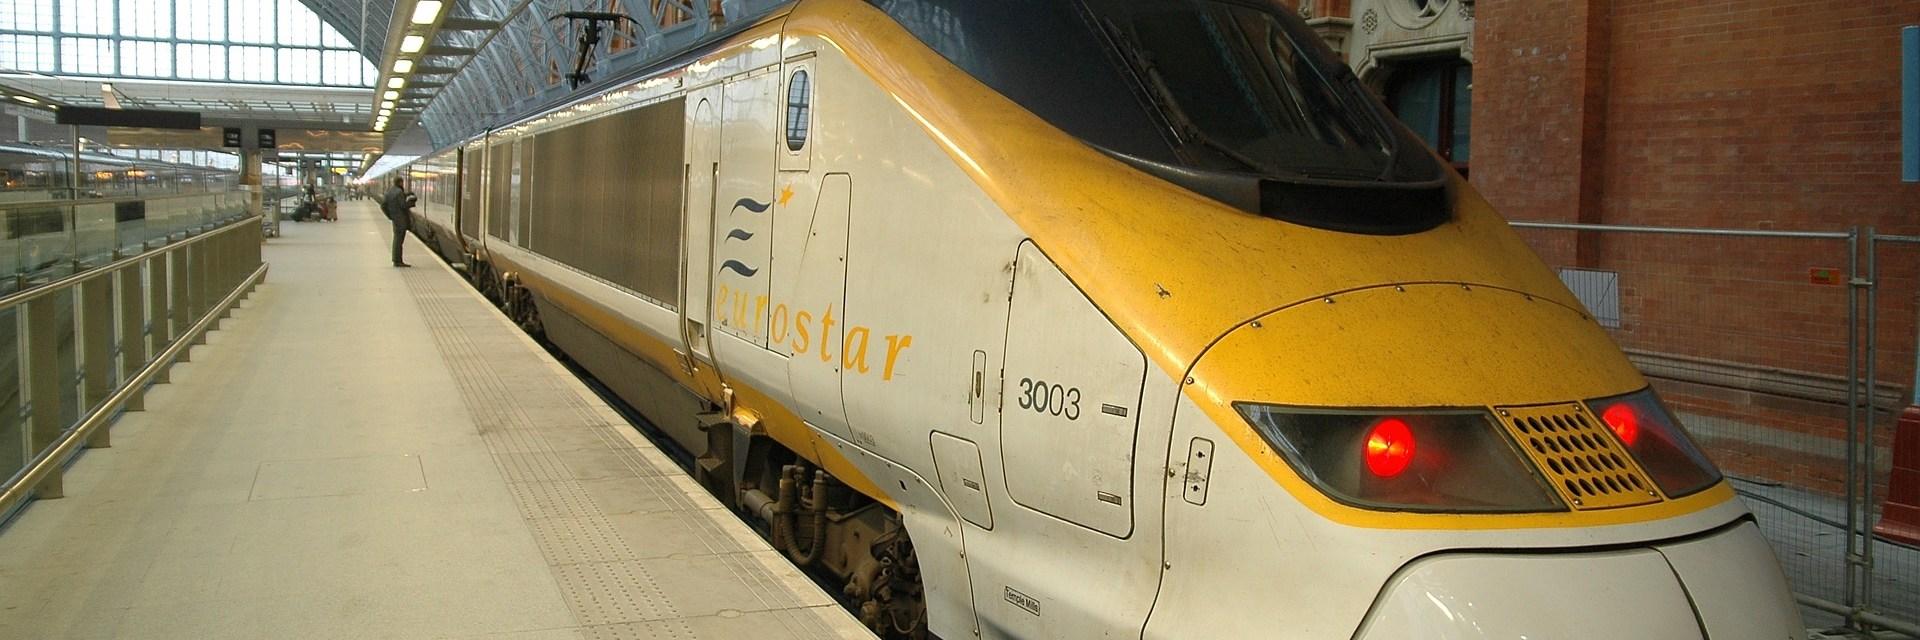 Eurostar - Hackers Breach Eurostar, Forcing Password Resets